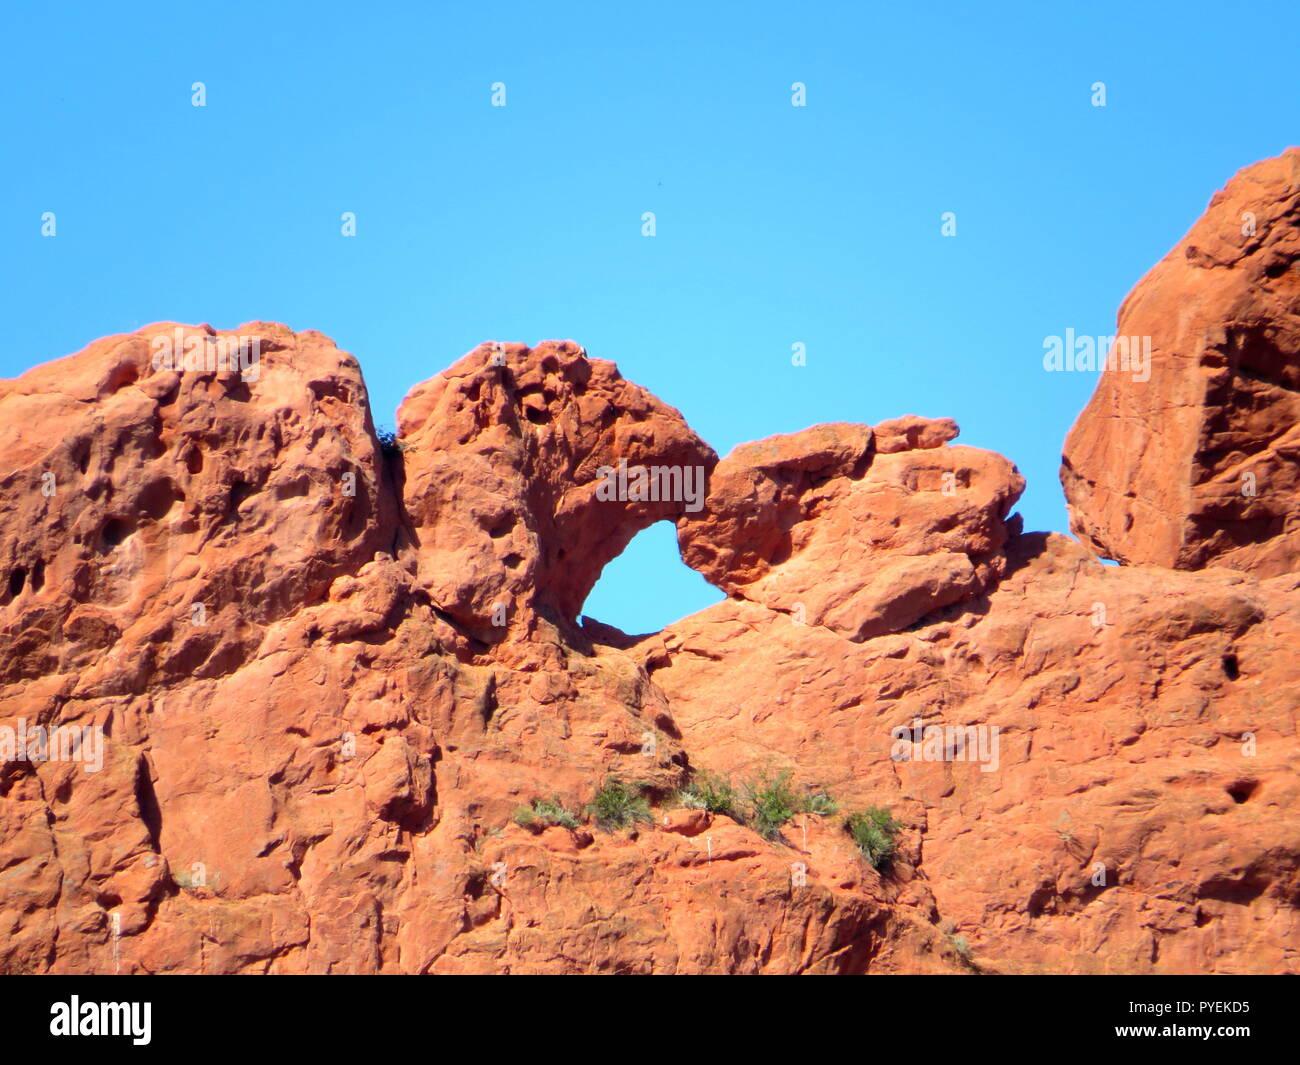 Kissing camel rocks, Garden of the Gods, Colorado - Stock Image